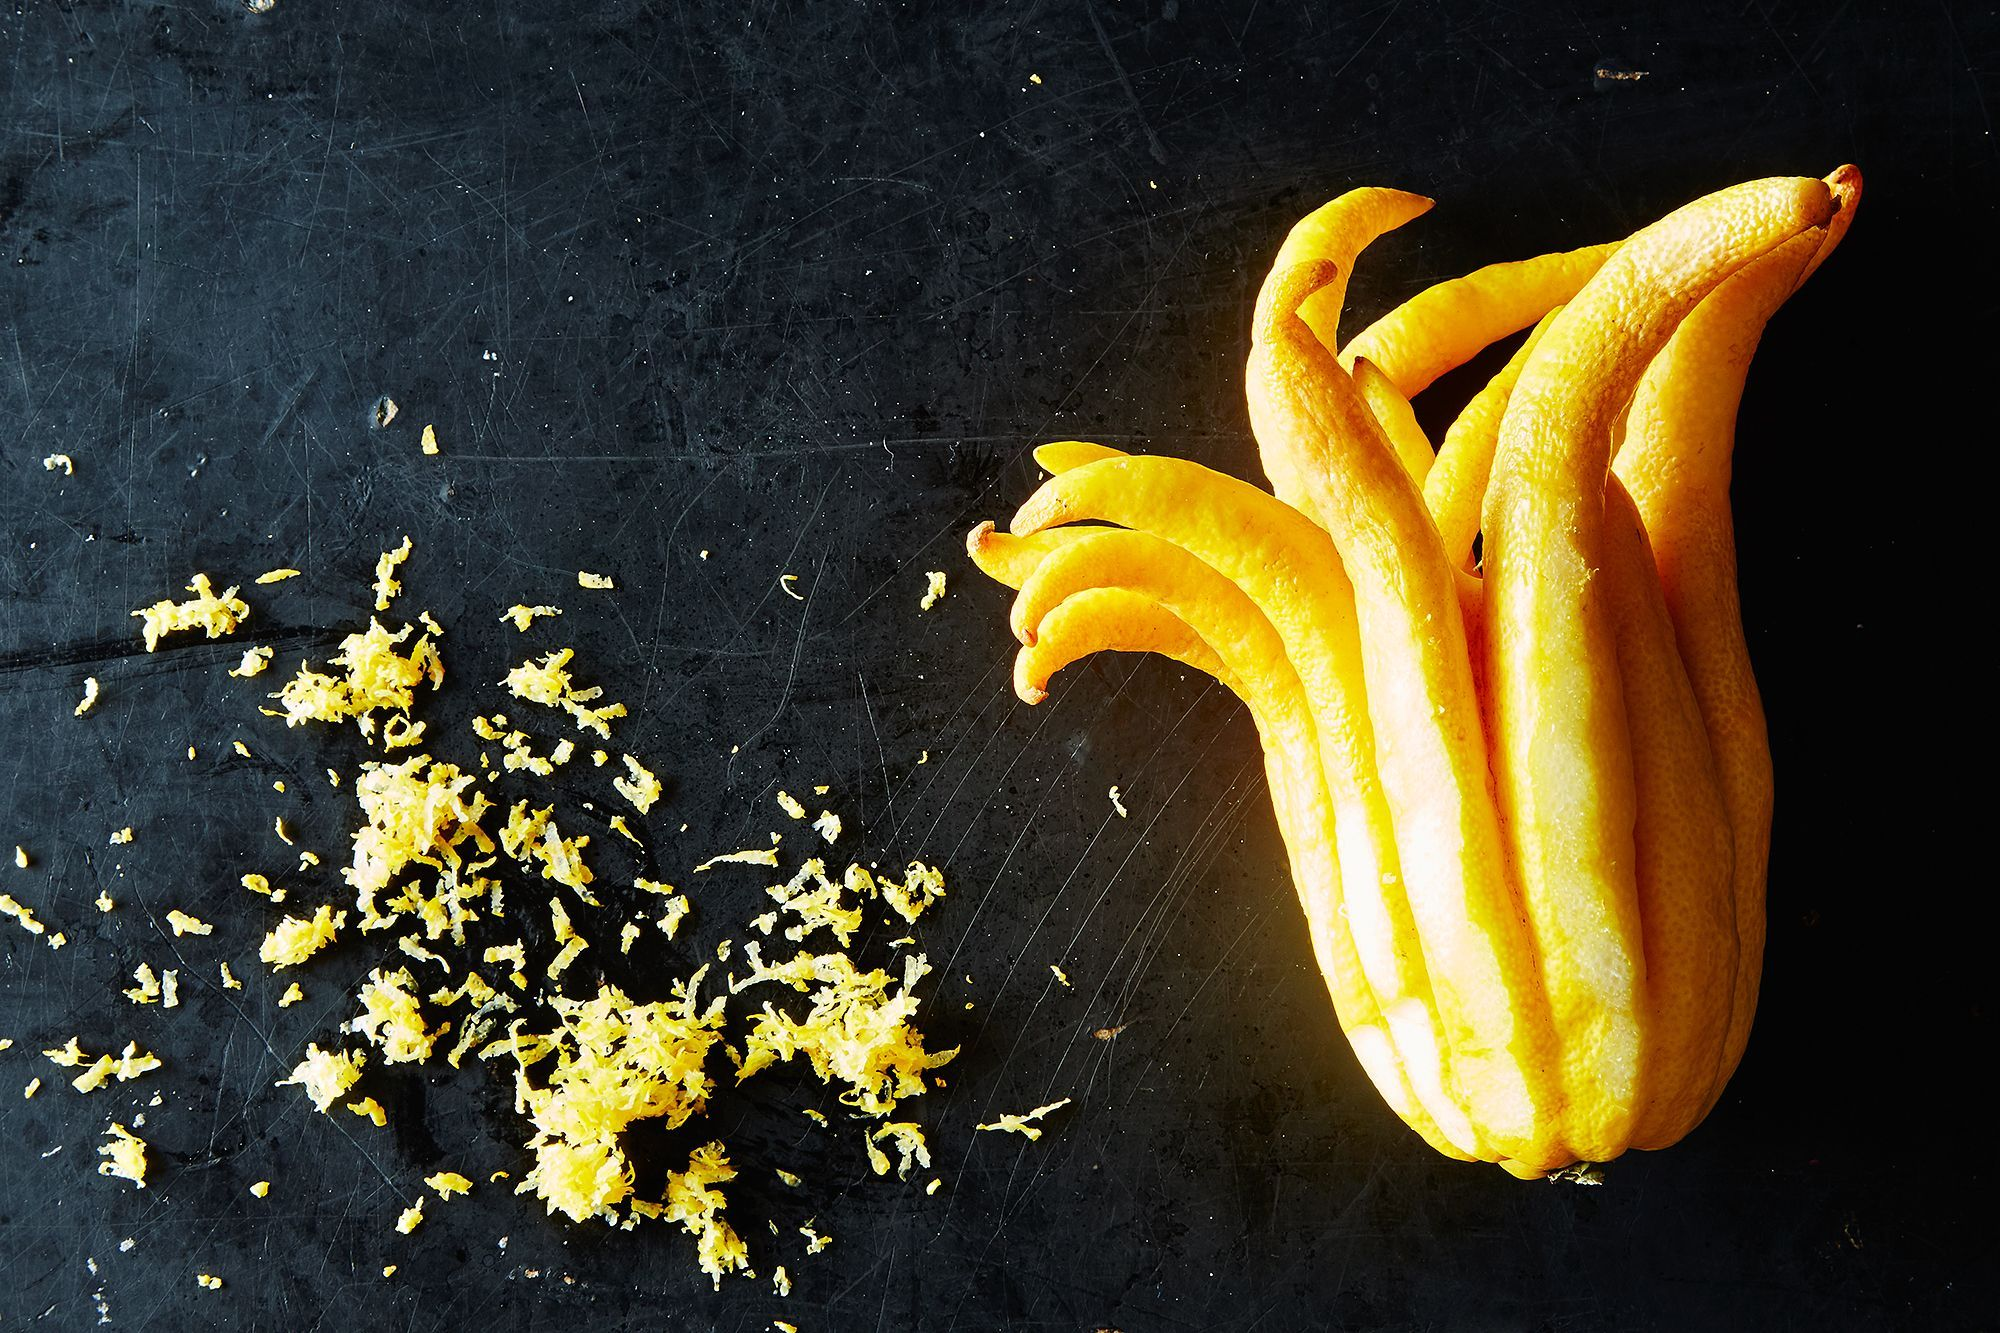 5 Citrus Fruits to Brighten Your Days Citrus fruit